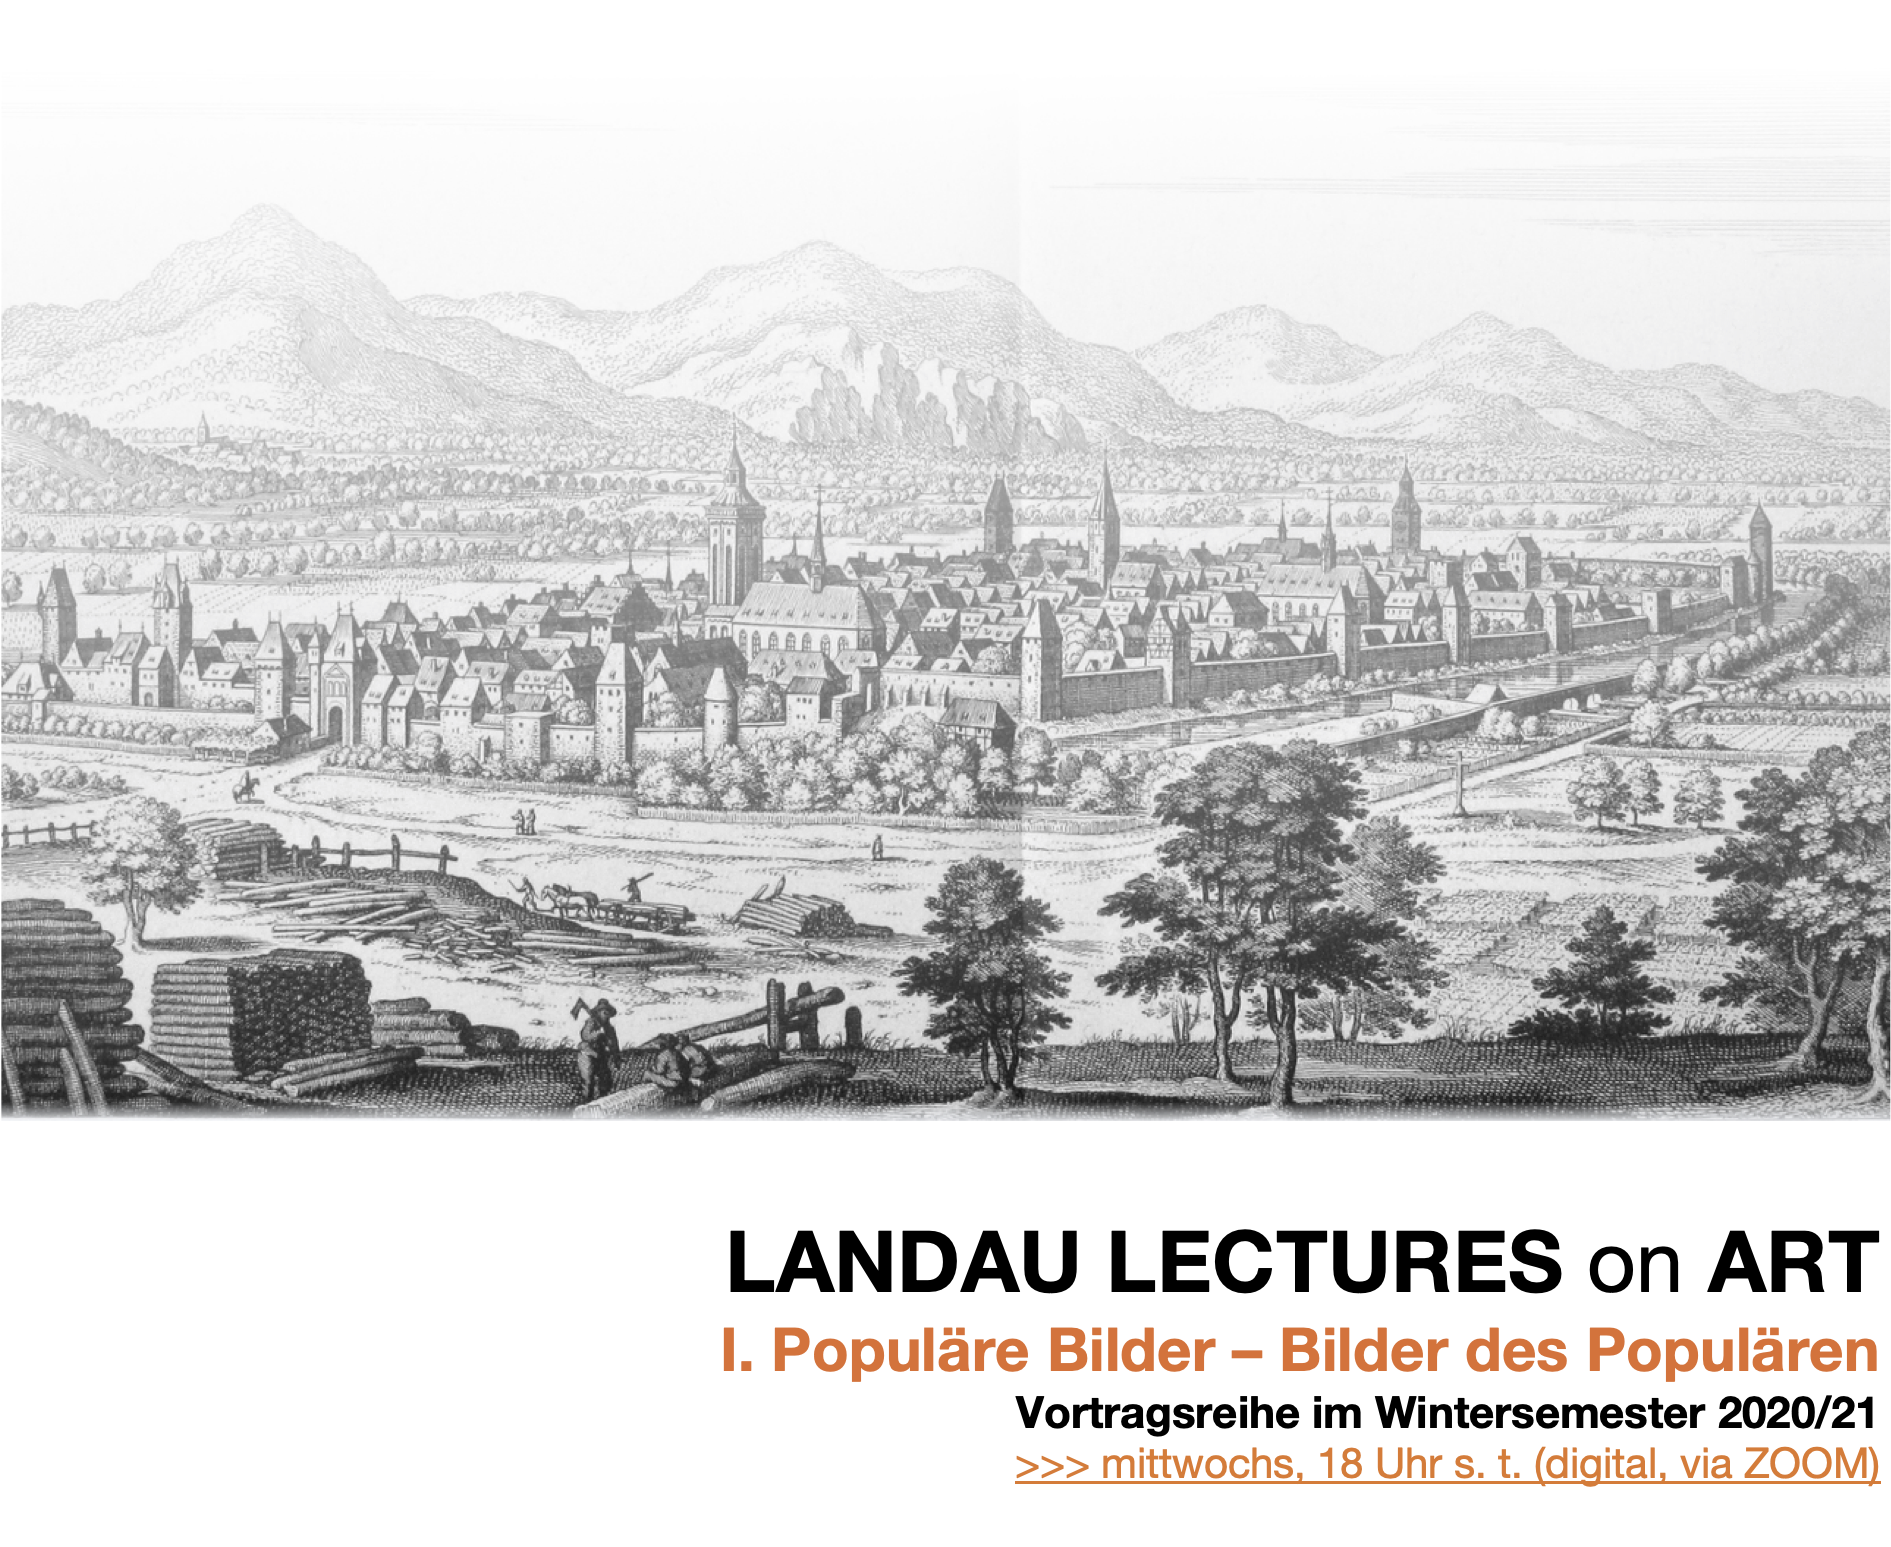 https://www.uni-koblenz-landau.de/de/landau/fb6/kunst/aktuelles/Vortragsreihe_KuWi_2020-21_final_neu.png